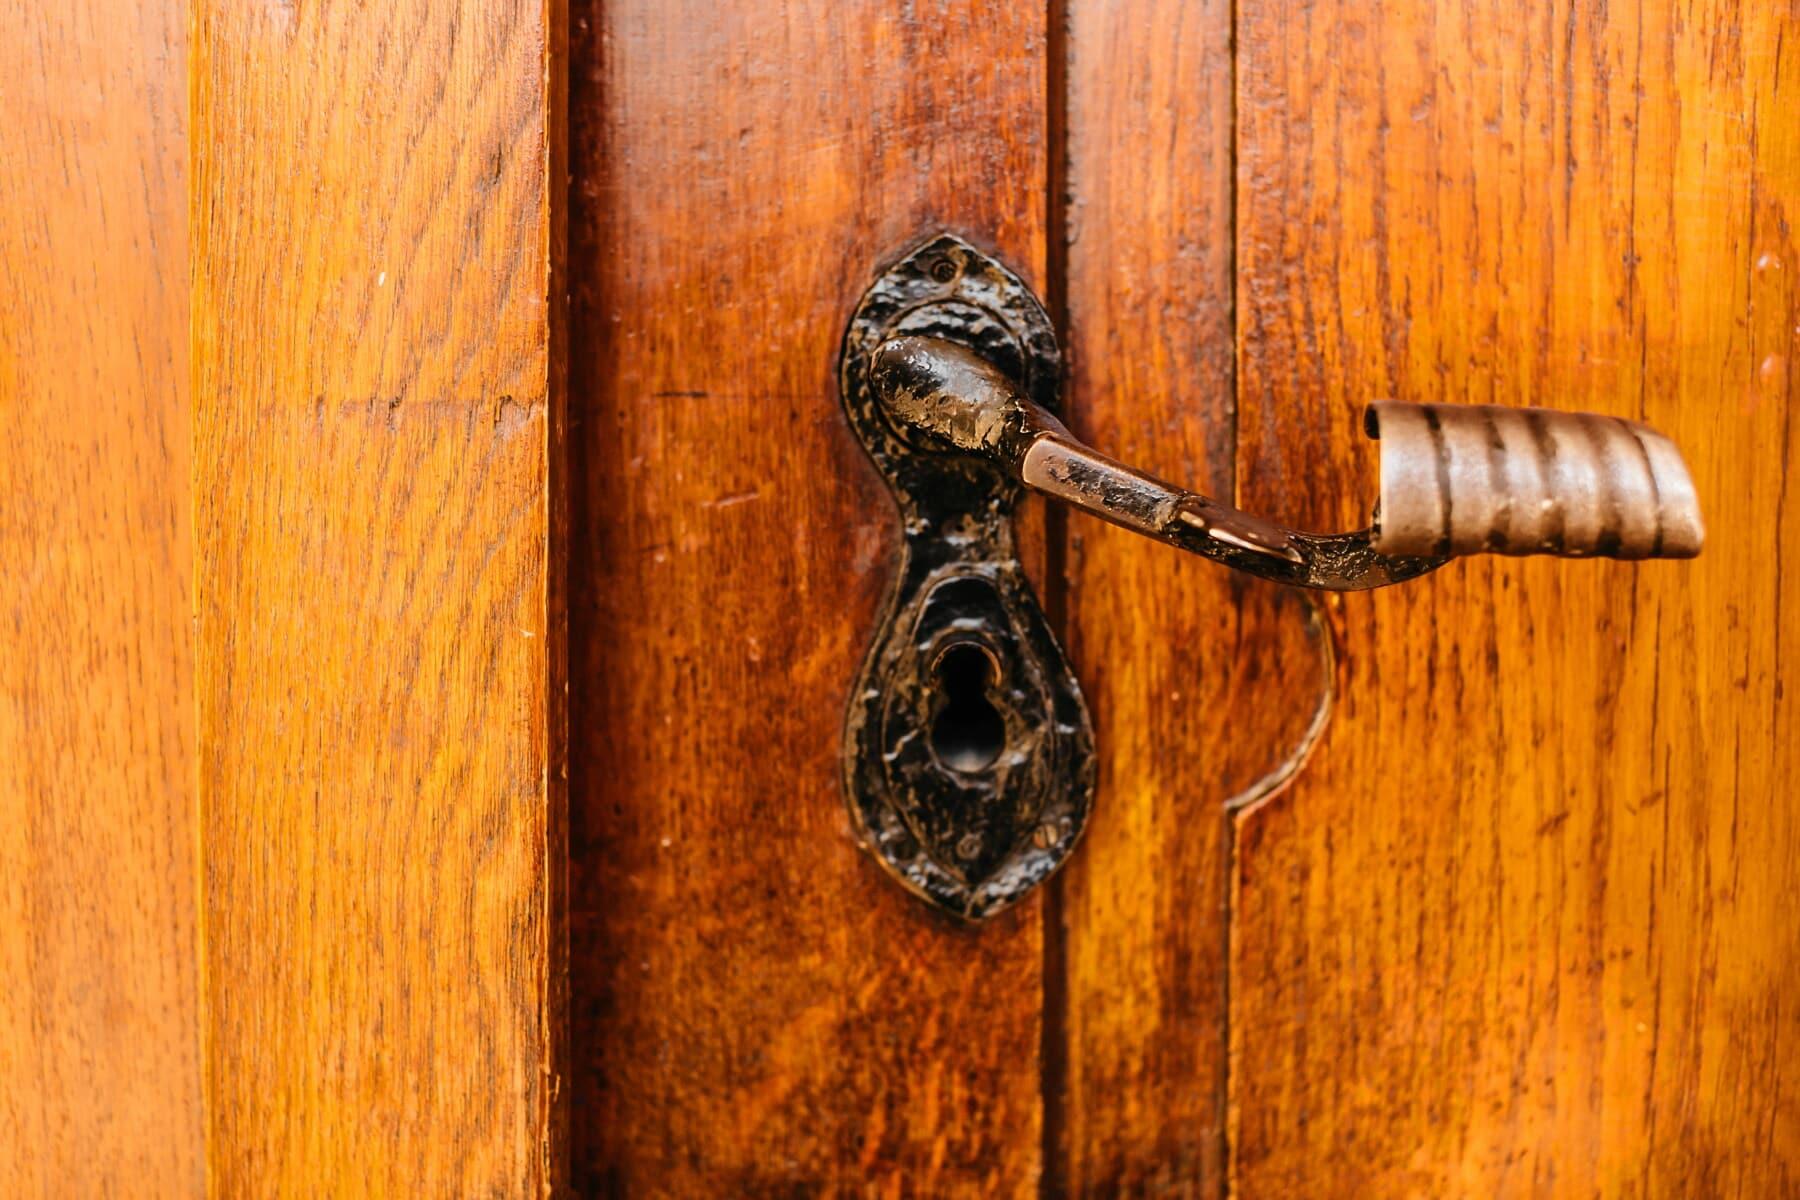 door, old fashioned, baroque, keyhole, old style, hardwood, front door, carpentry, oak, lock